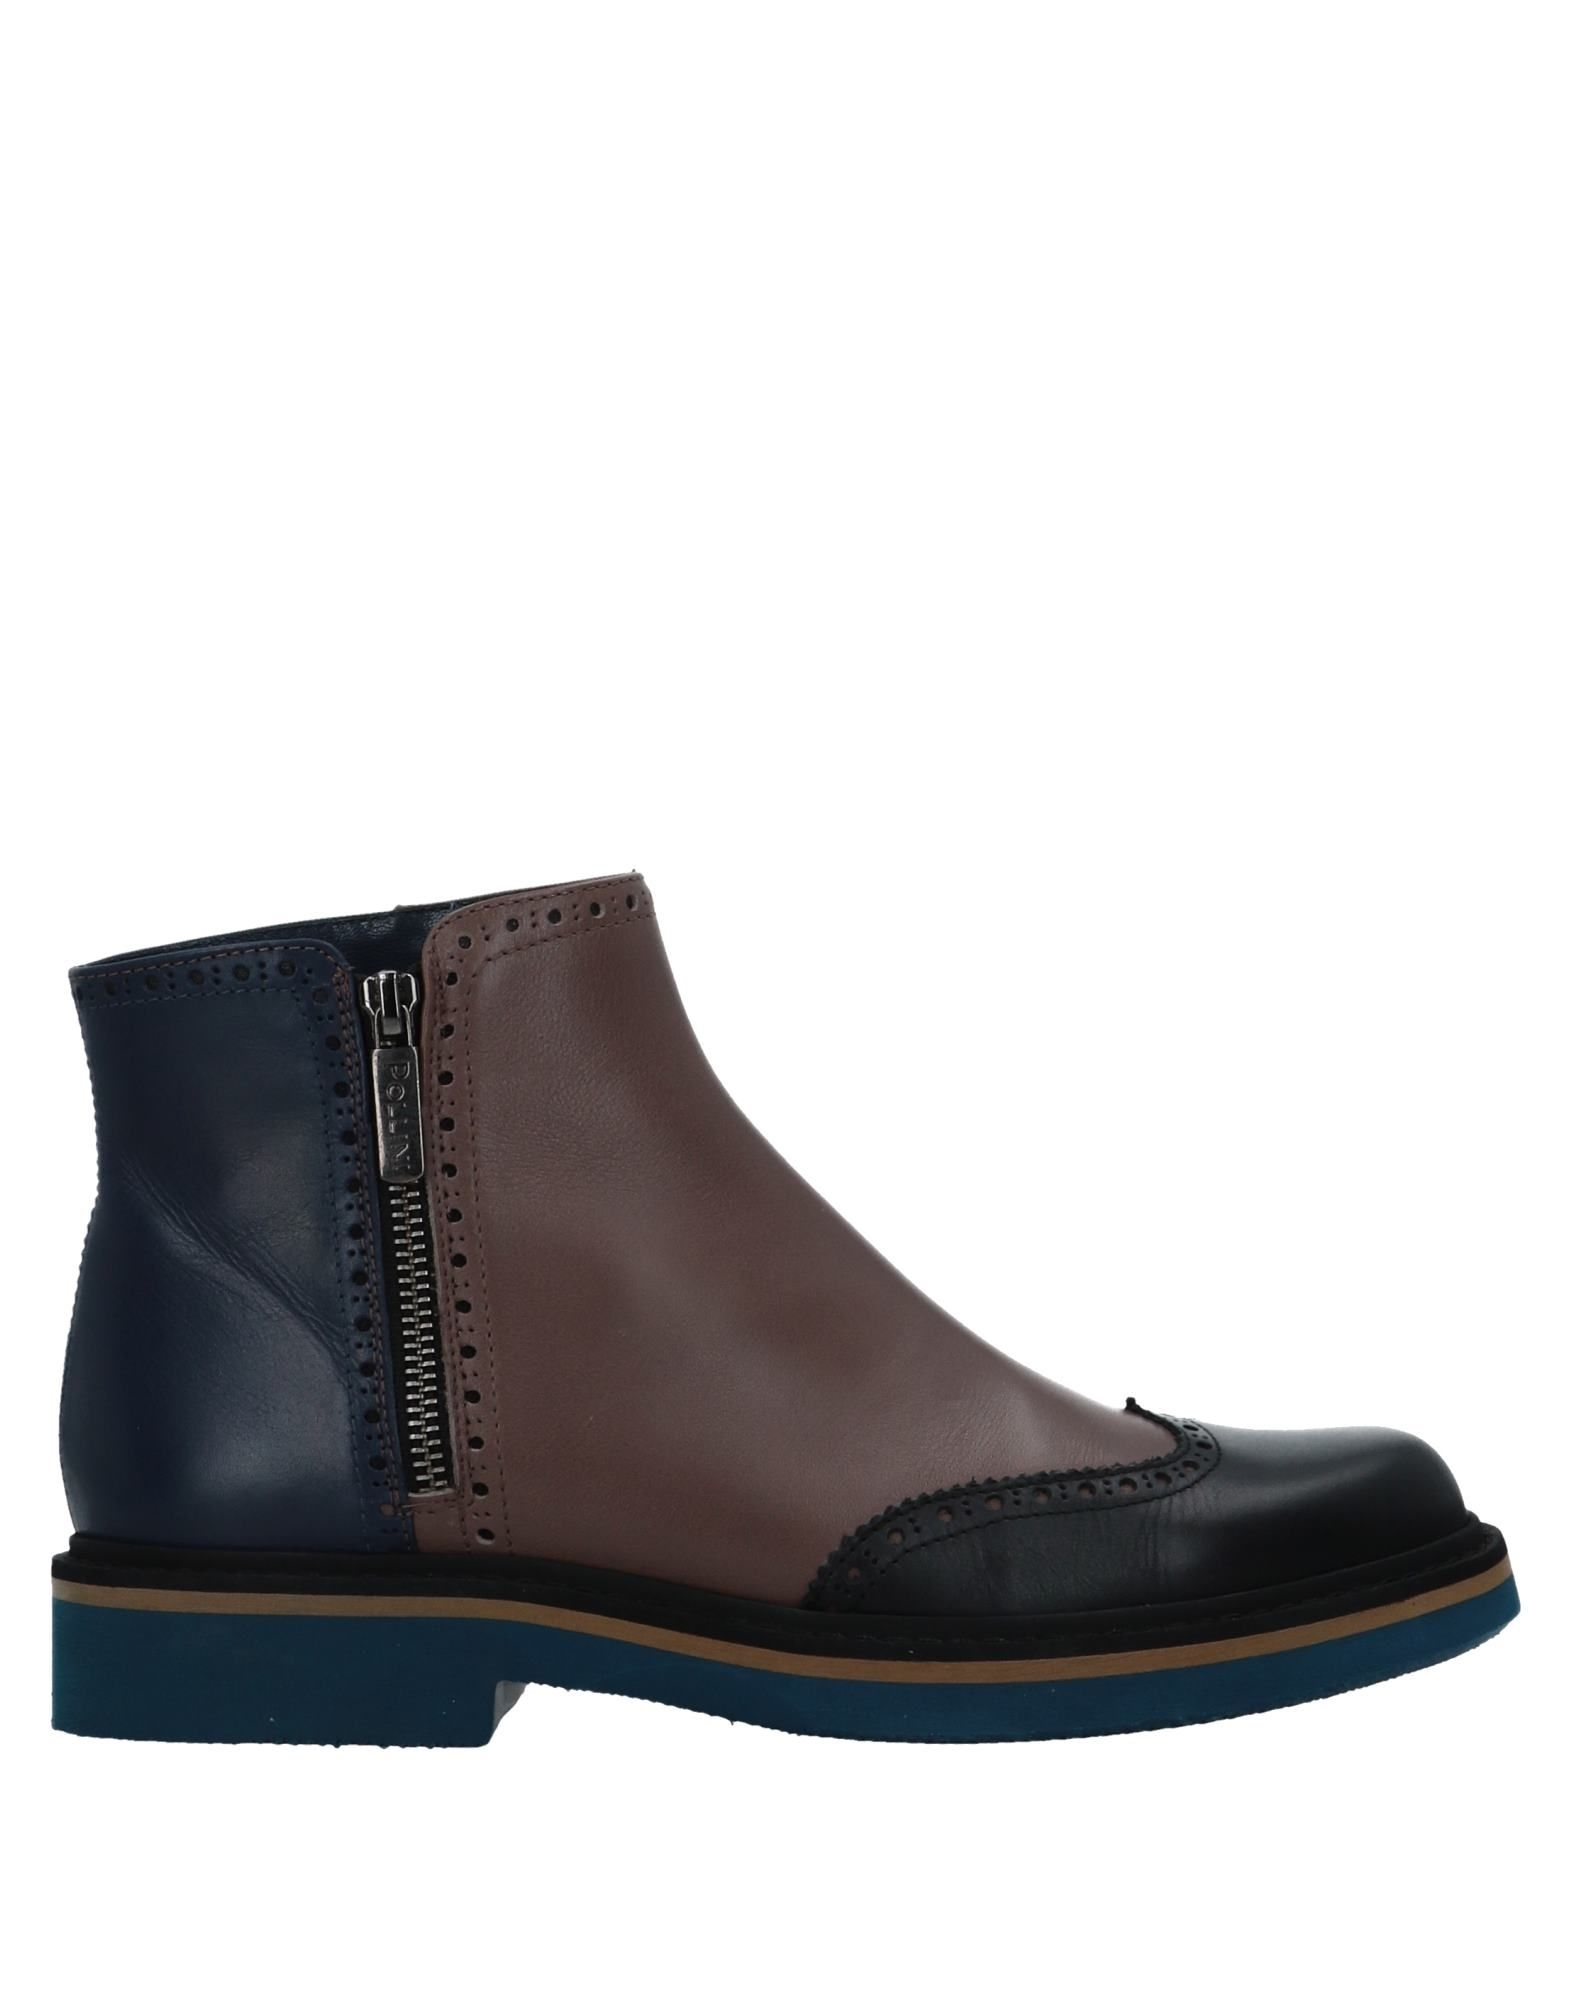 Pollini Stiefelette Damen aussehende  11535892TRGut aussehende Damen strapazierfähige Schuhe 818e9e